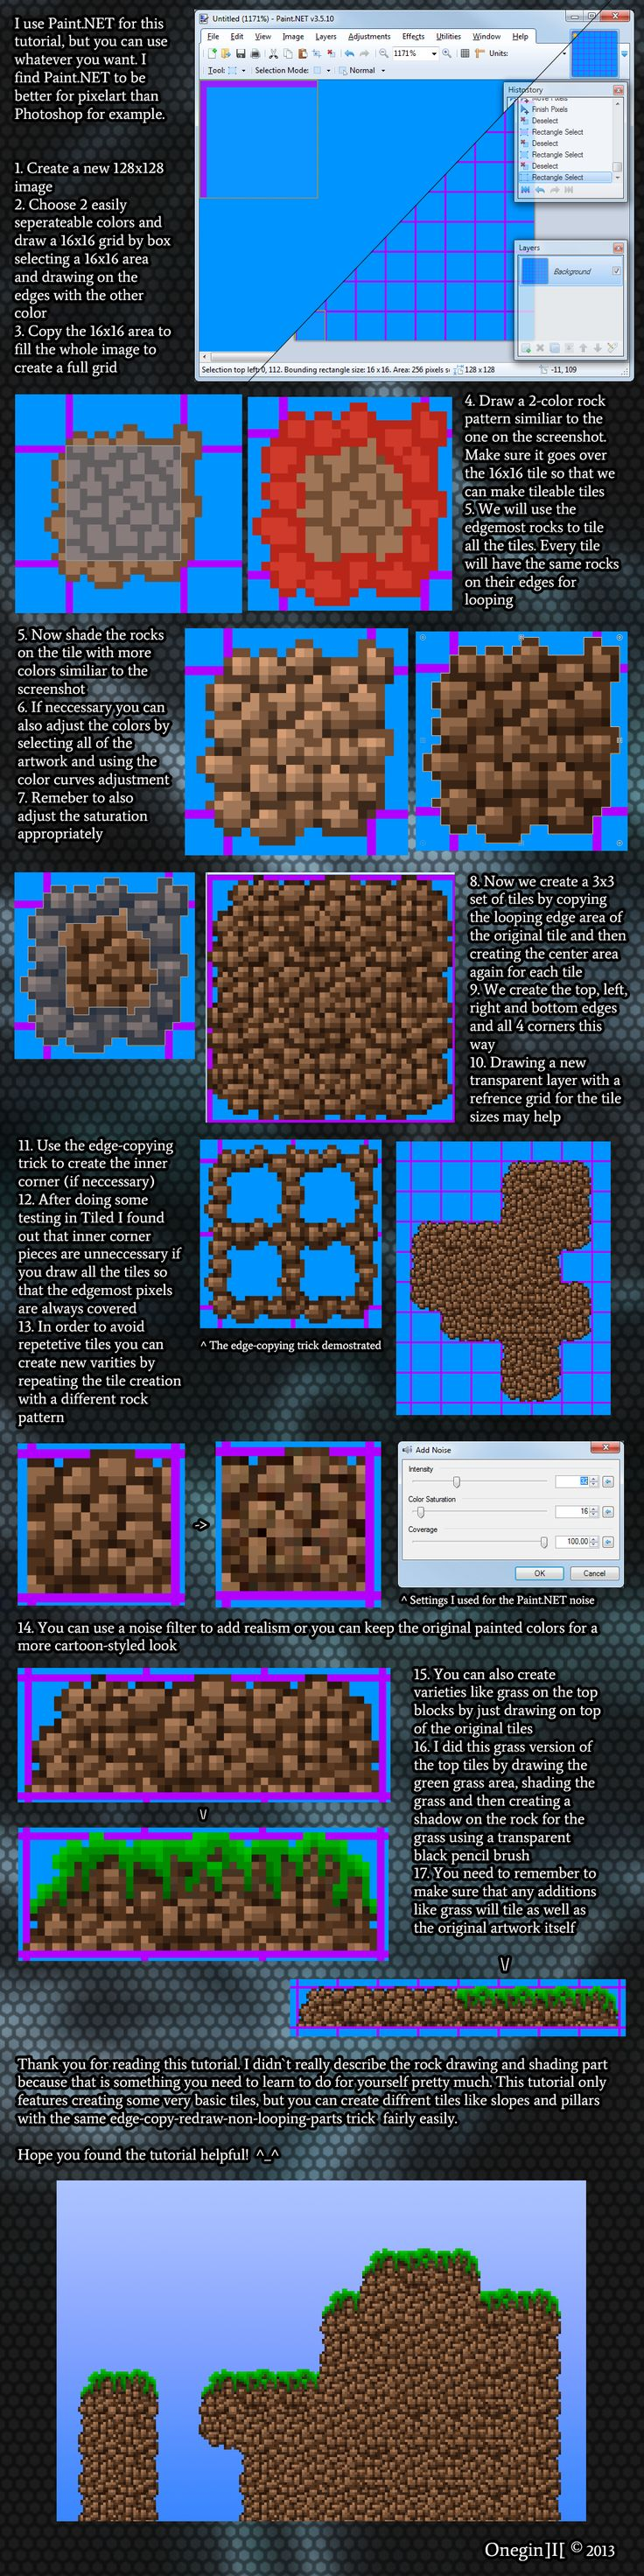 Drawn pixel art 32 bit Find and art on Best